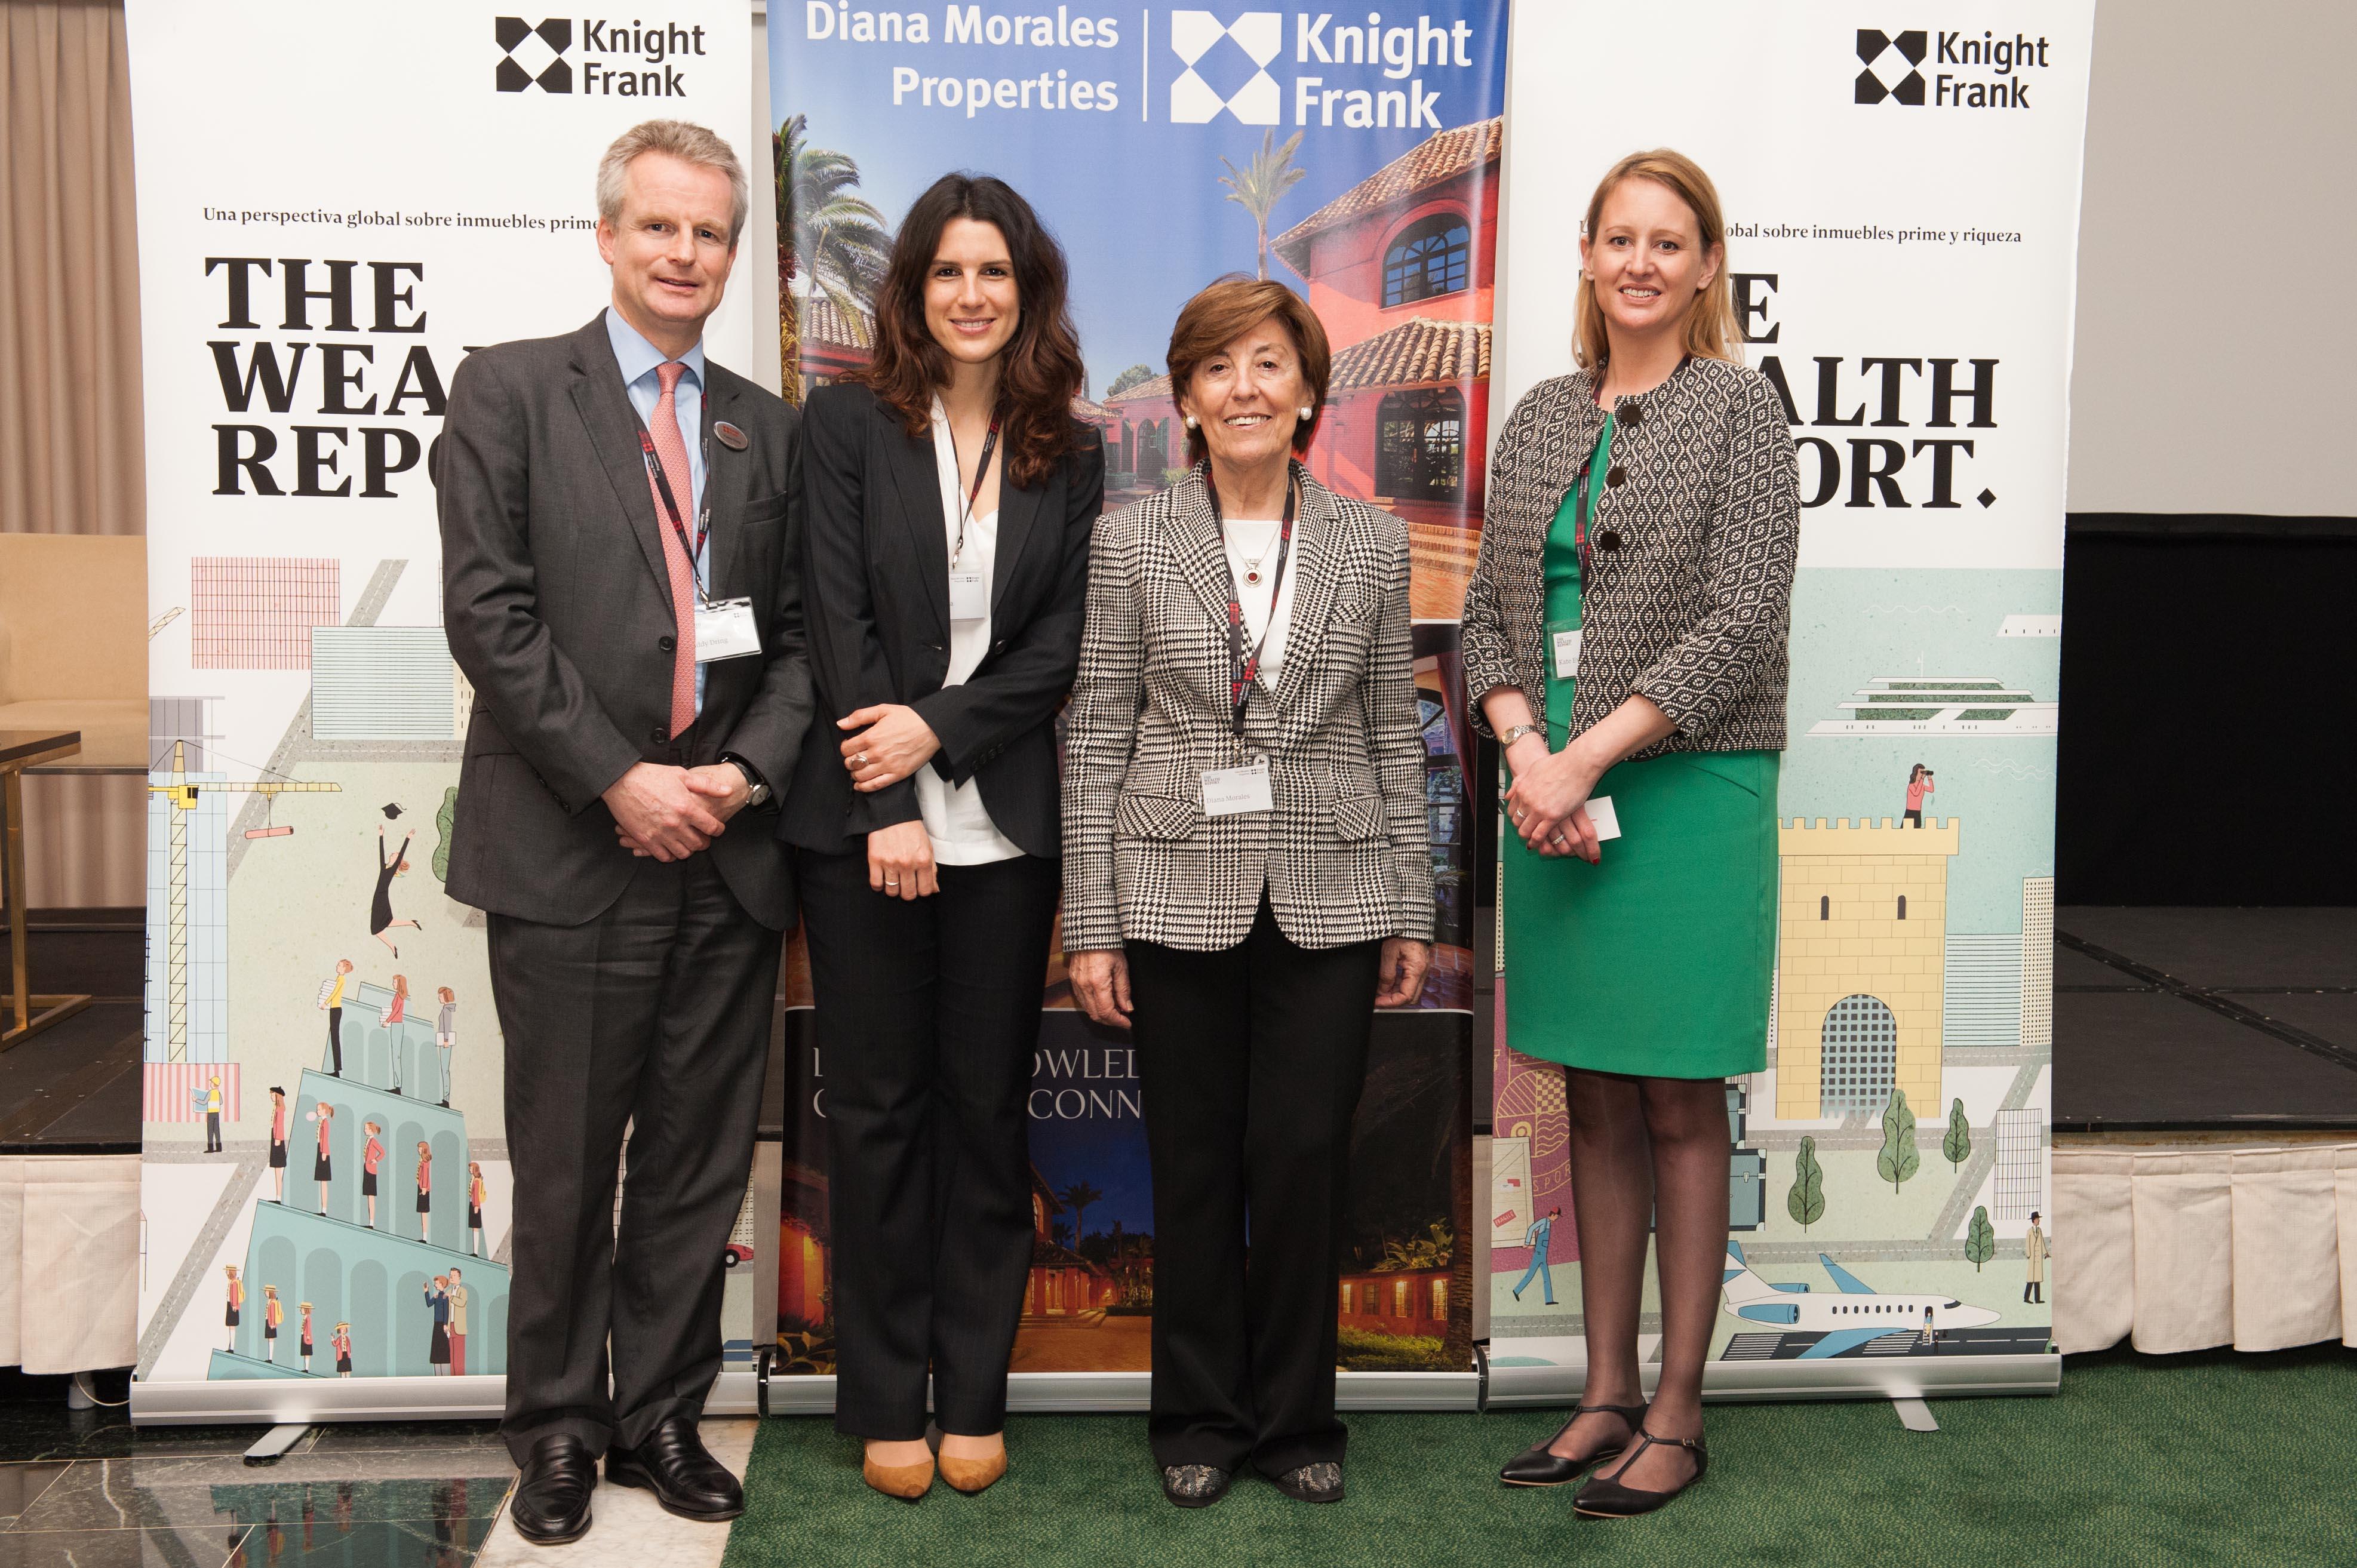 Knight Frank Wealth Report 2015 presented in Marbella